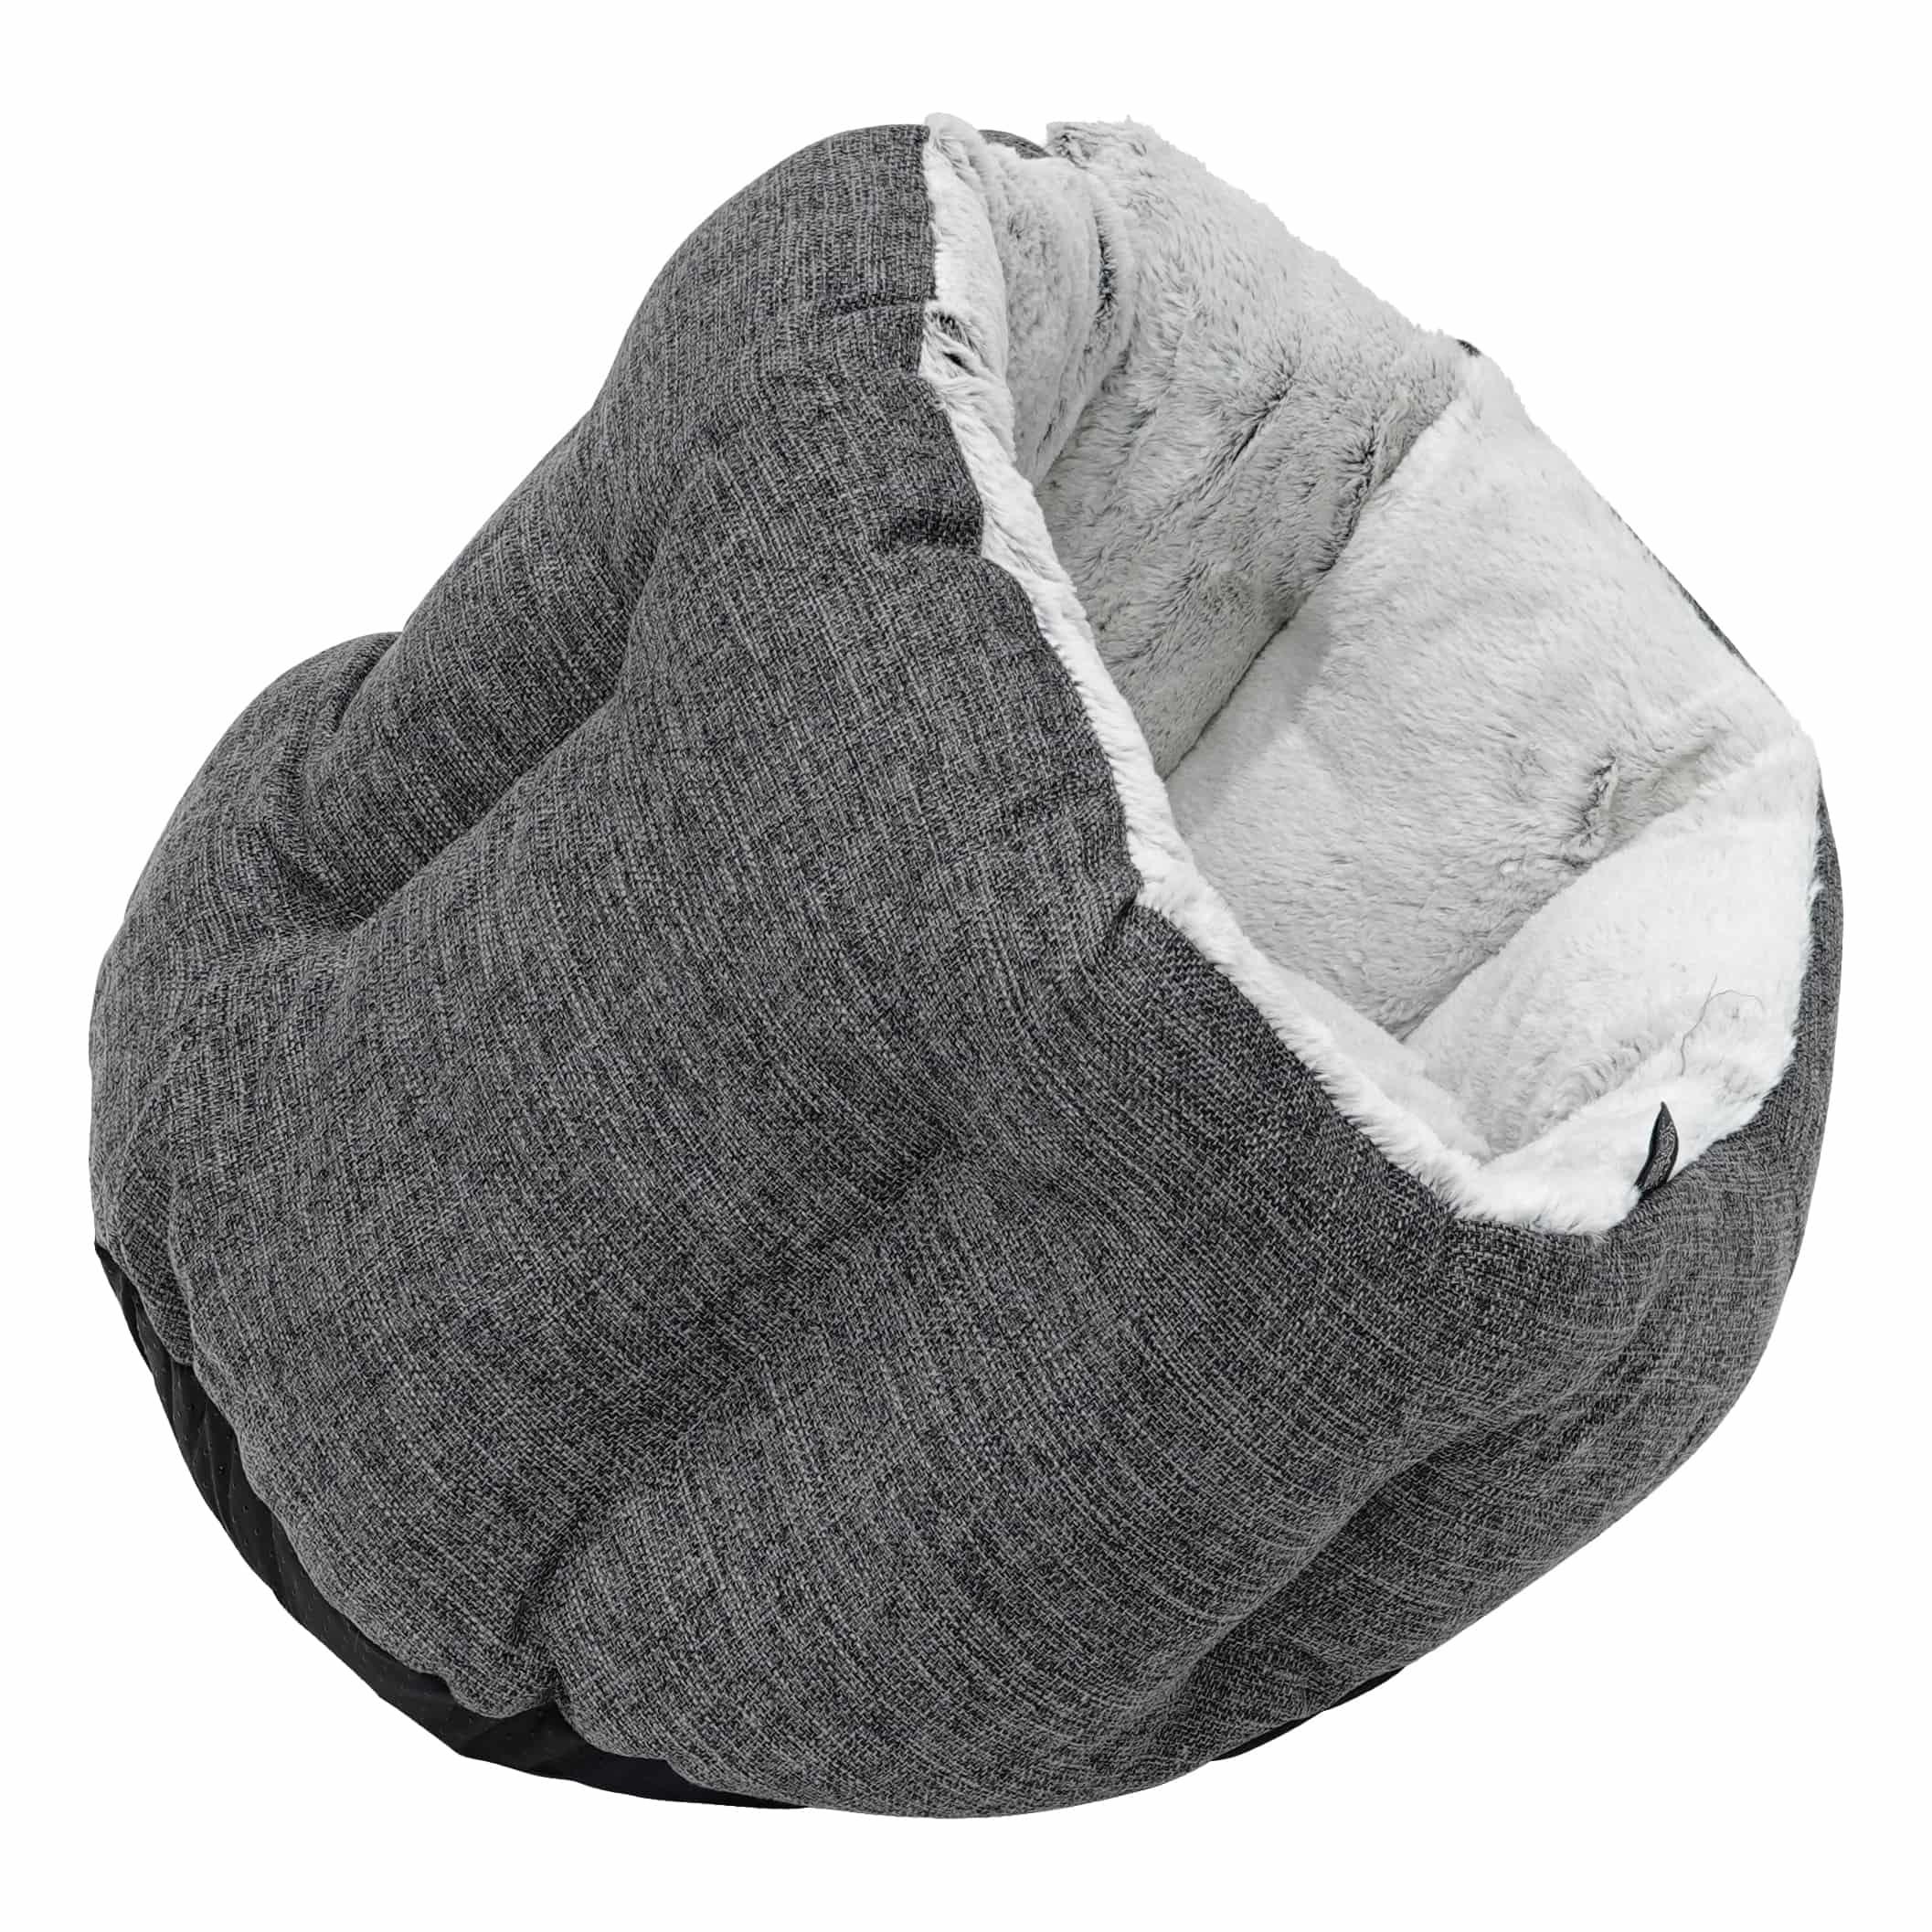 4Goodz Zachte Hondenmand Cocoon - 50x38 cm - Donkergrijs